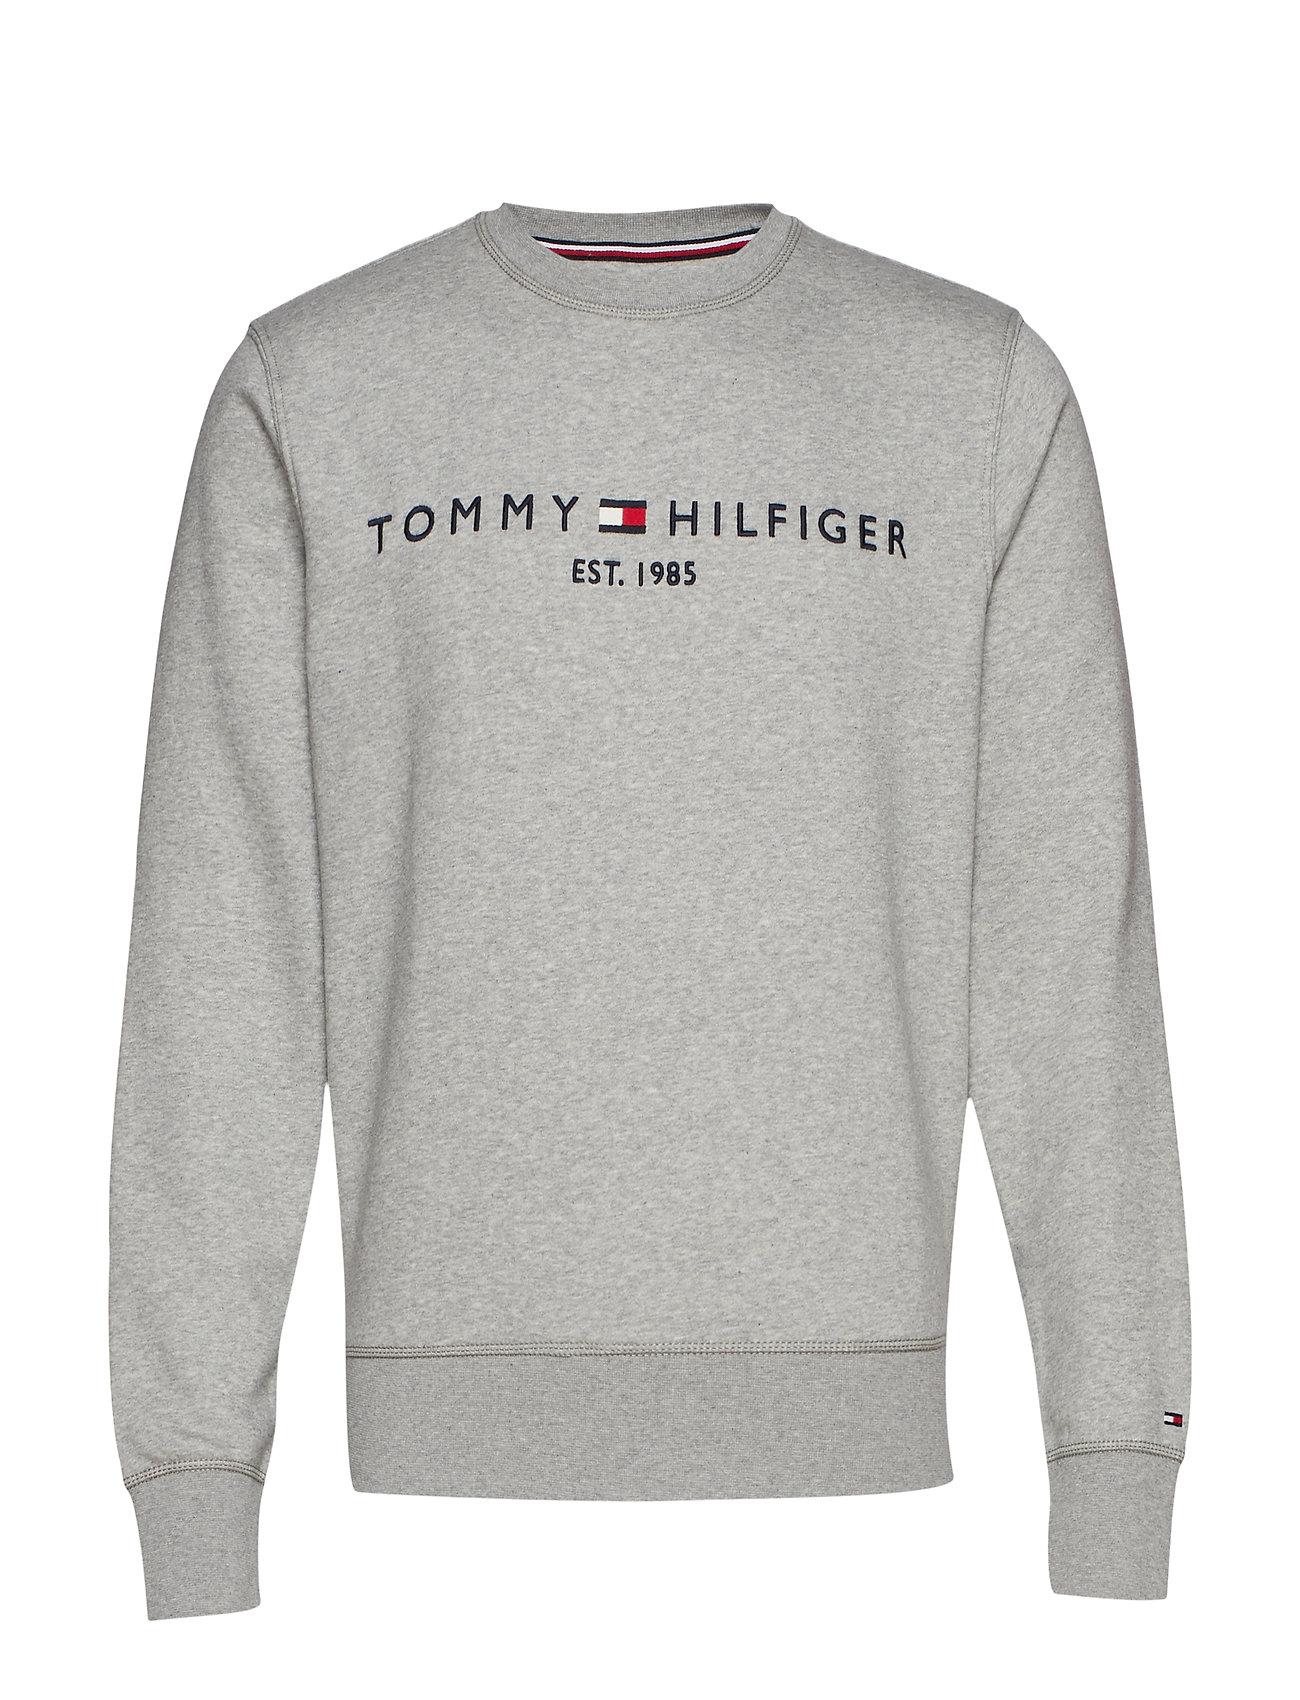 Tommy Hilfiger TOMMY LOGO SWEATSHIRT - CLOUD HEATHER